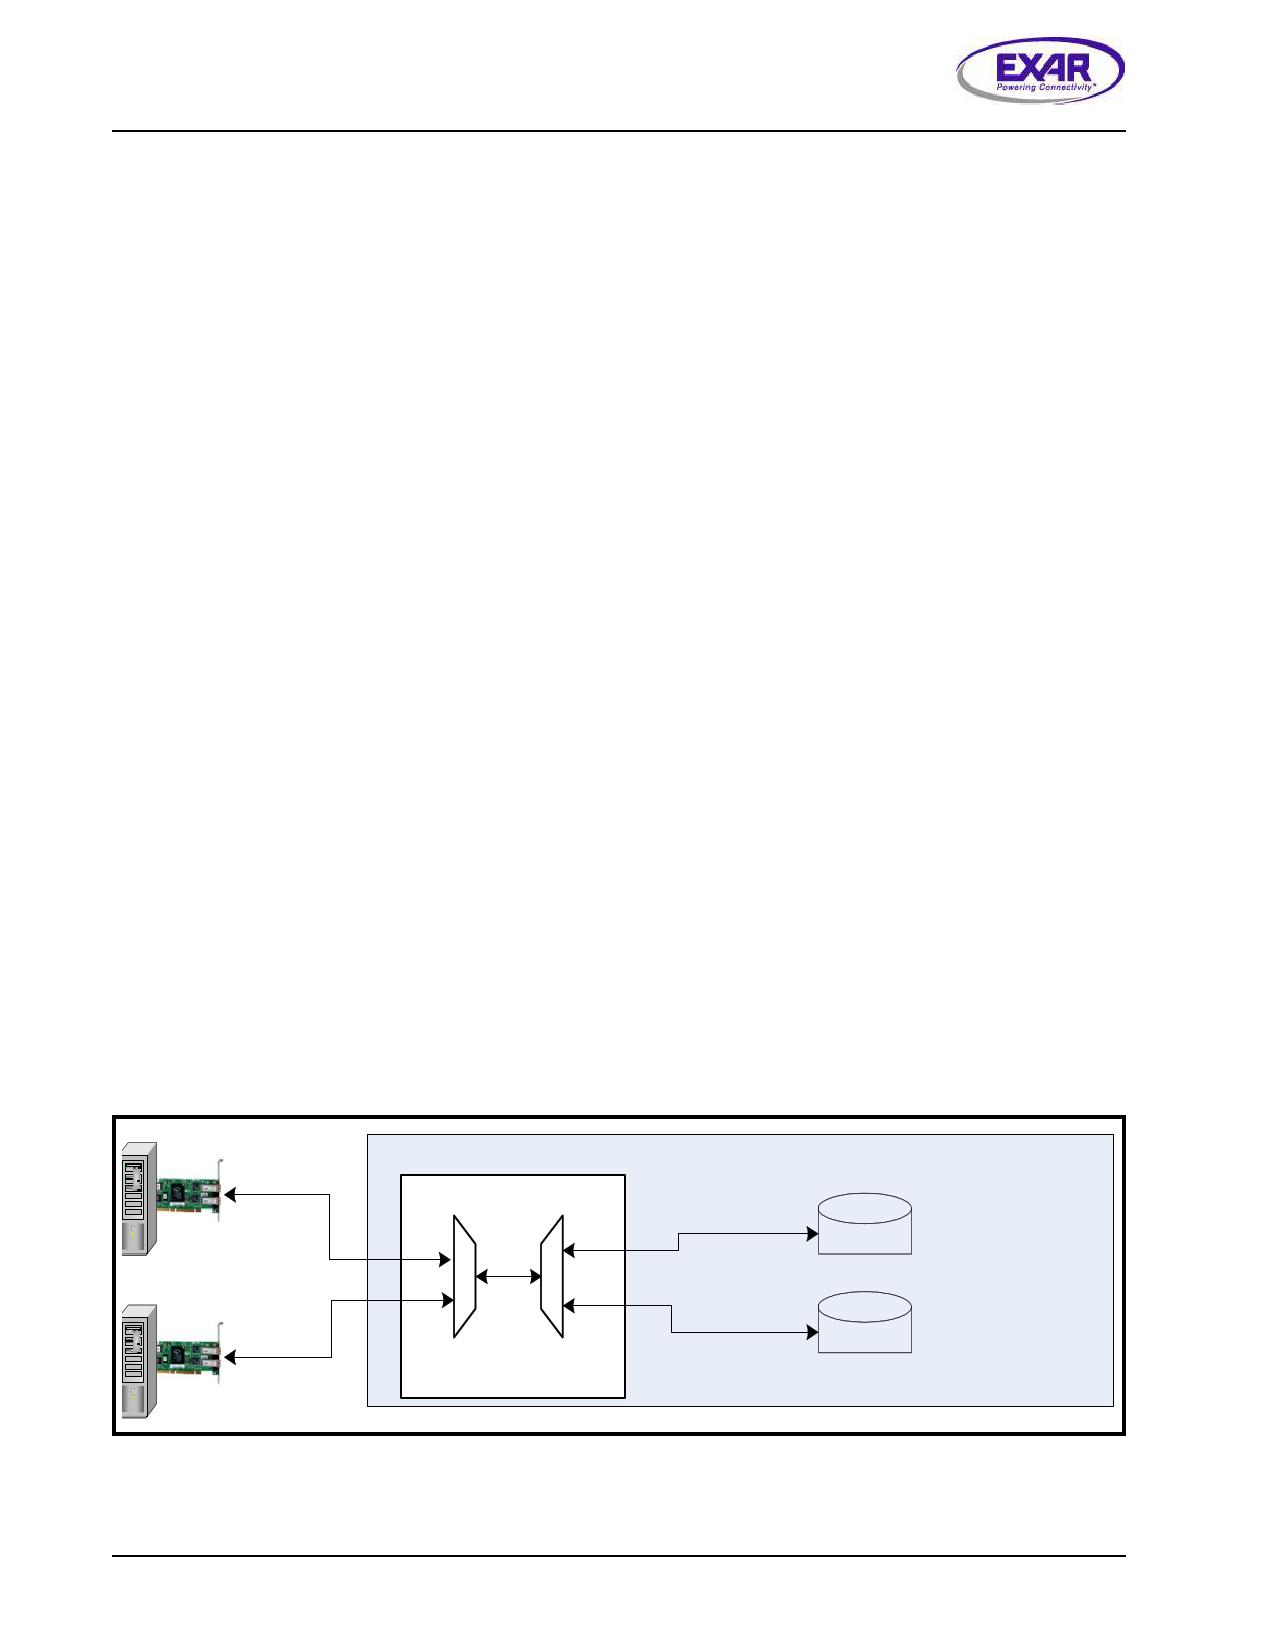 XRS10L220 pdf, equivalent, schematic